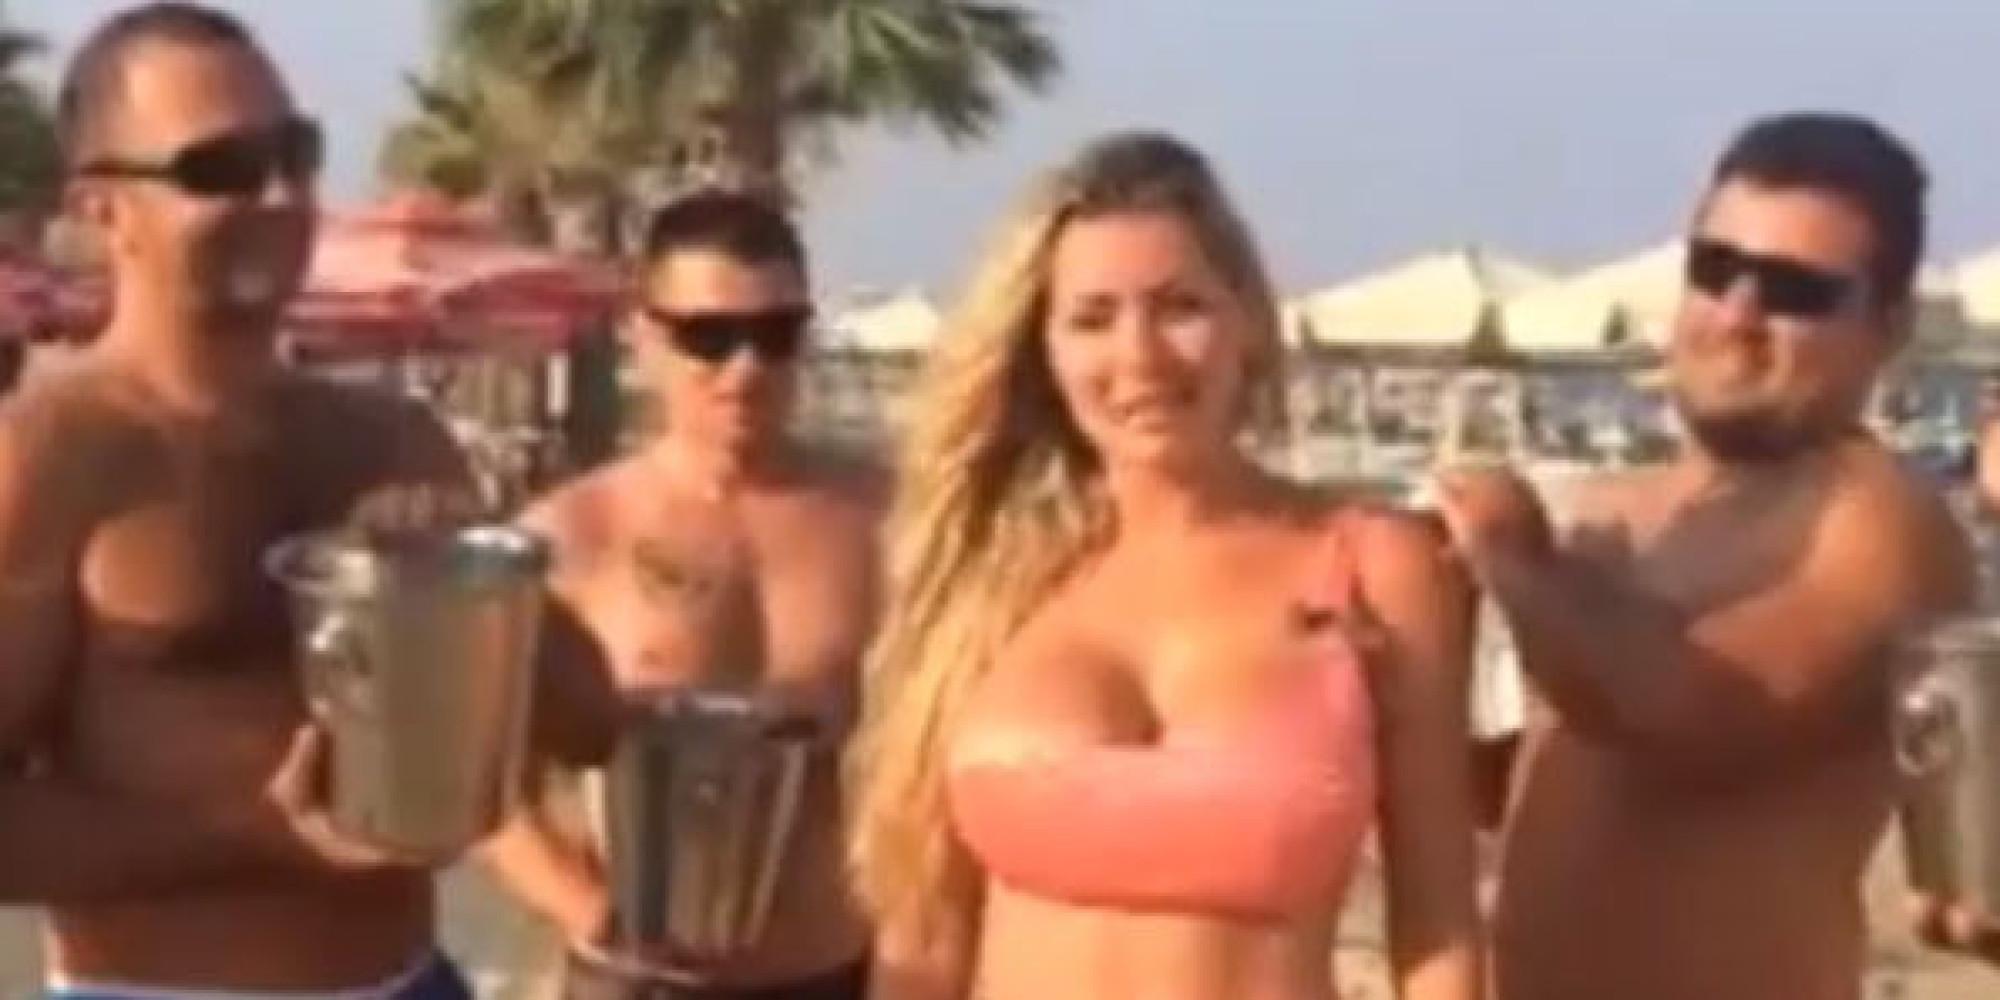 Nicola Mclean Pussy Amazing nicola mclean nude video - retro porn tube